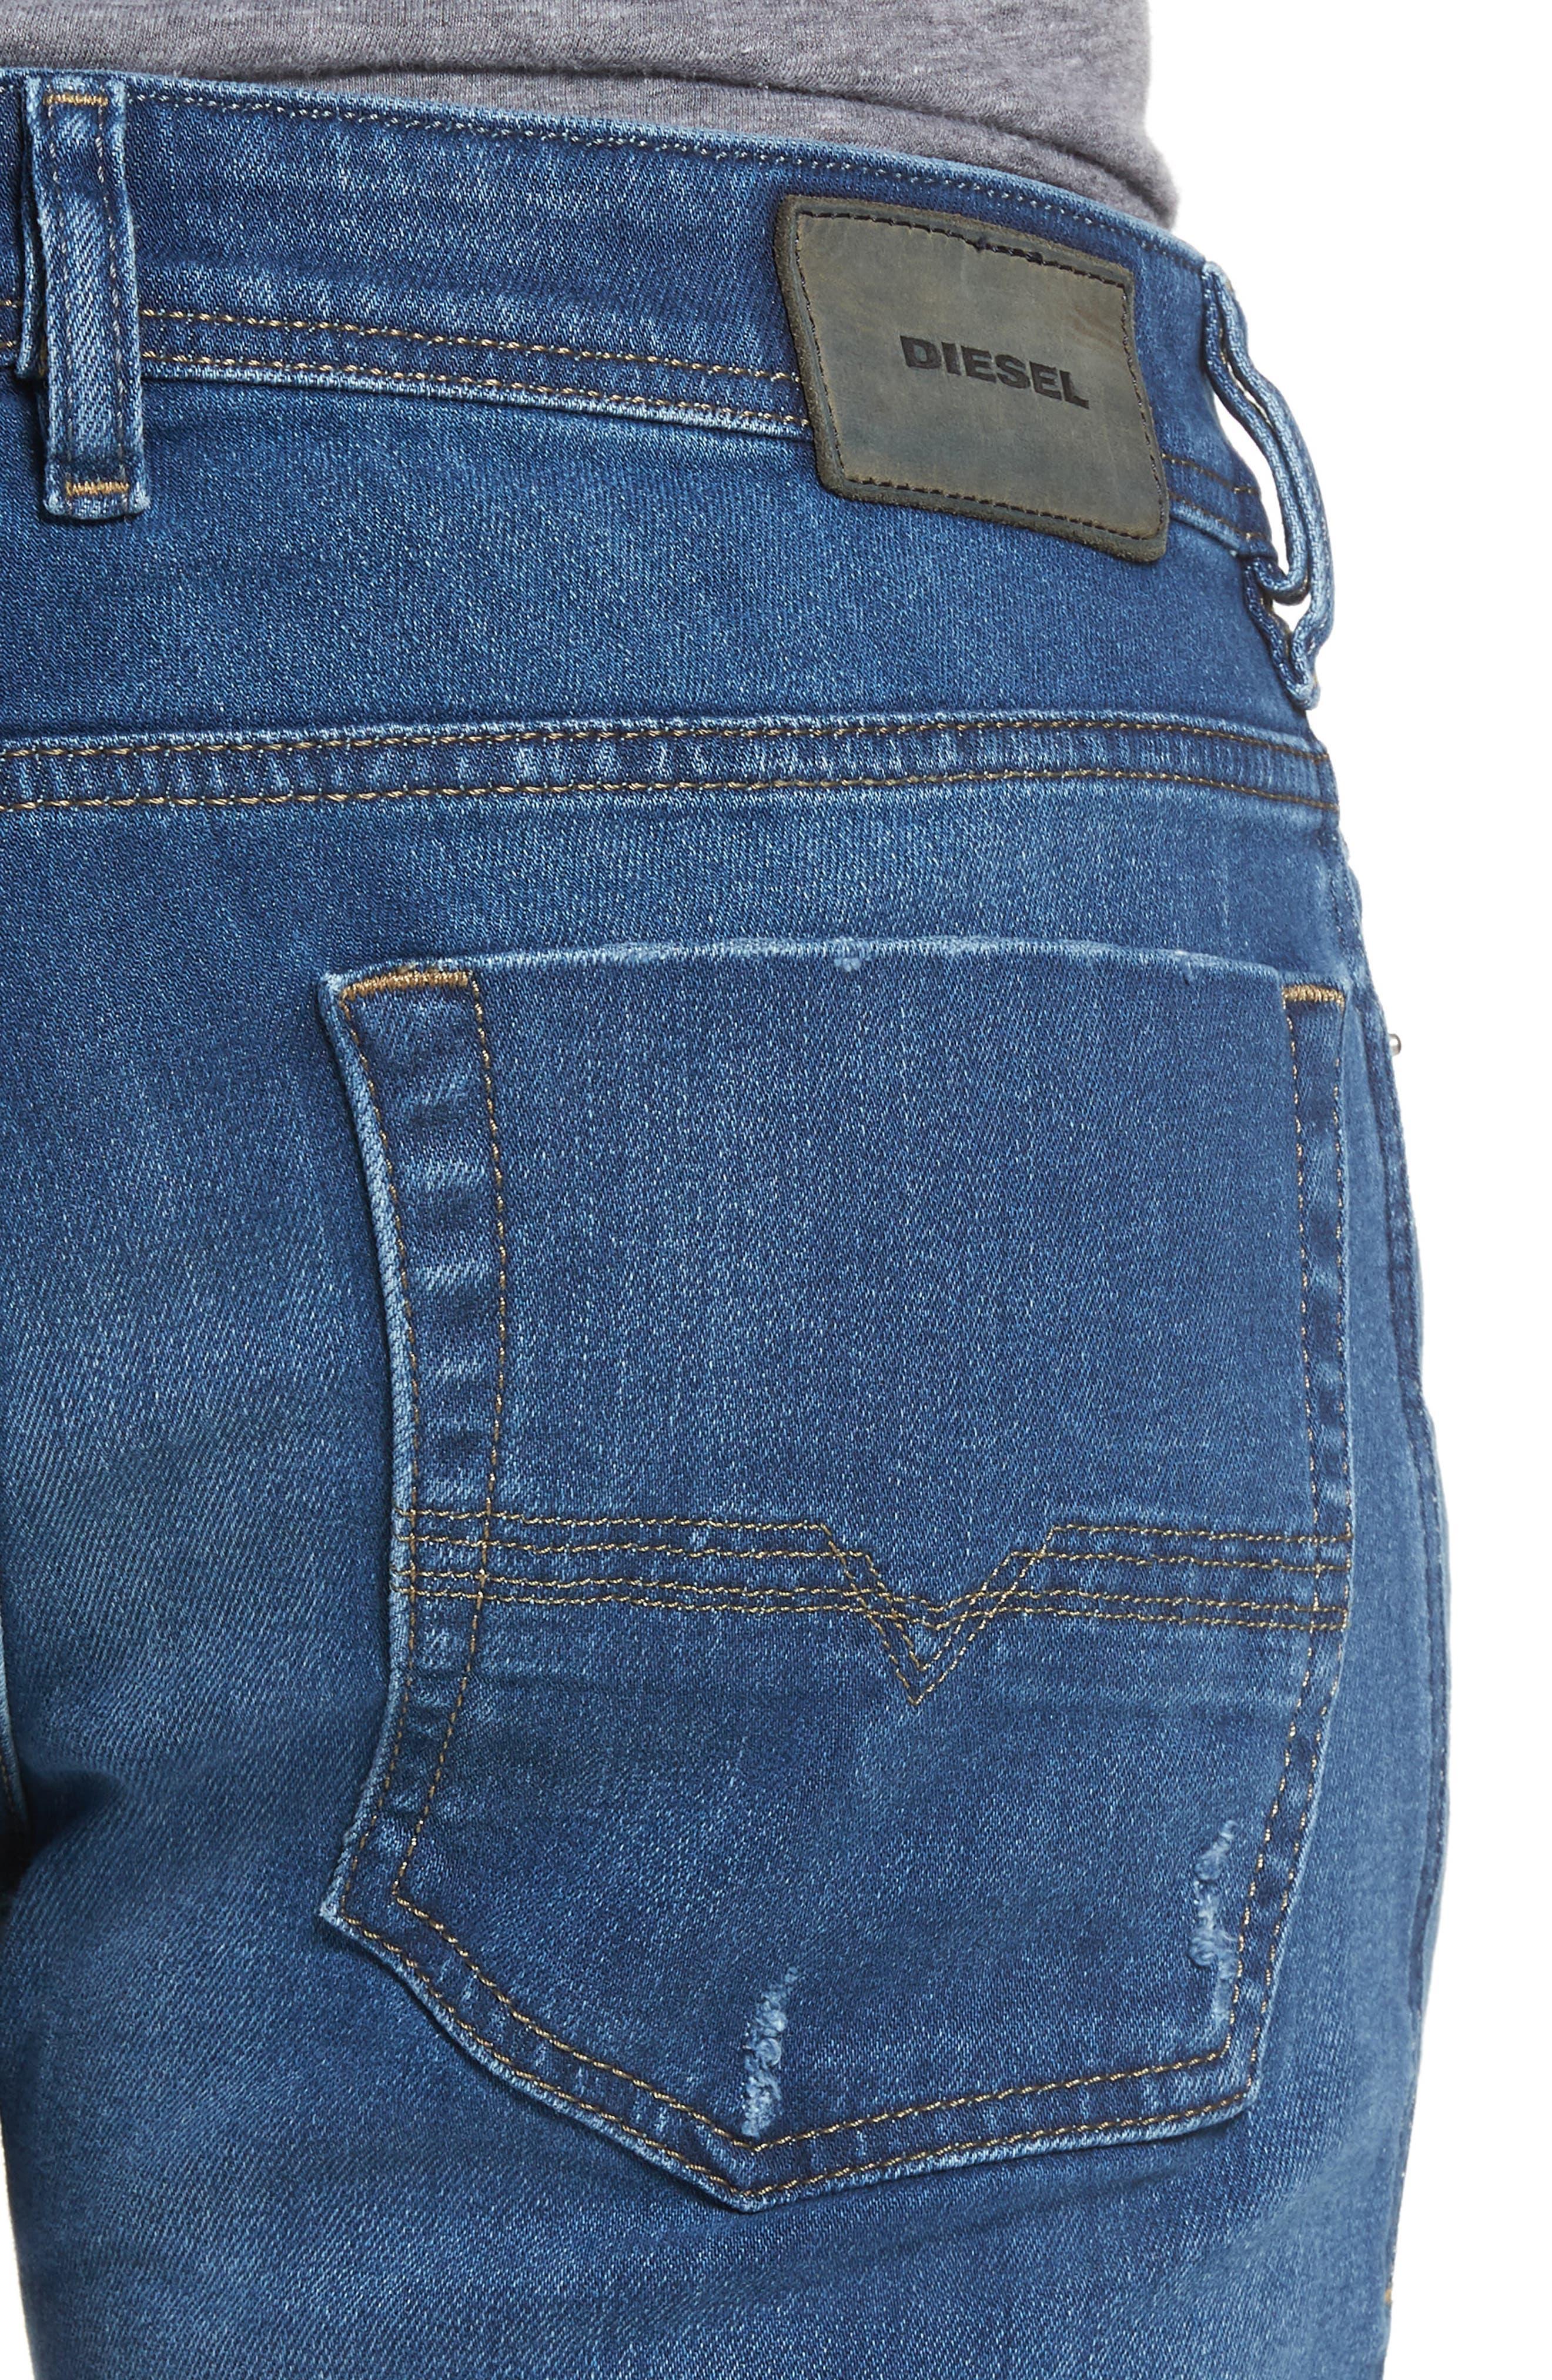 Zatiny Bootcut Jeans,                             Alternate thumbnail 4, color,                             Denim